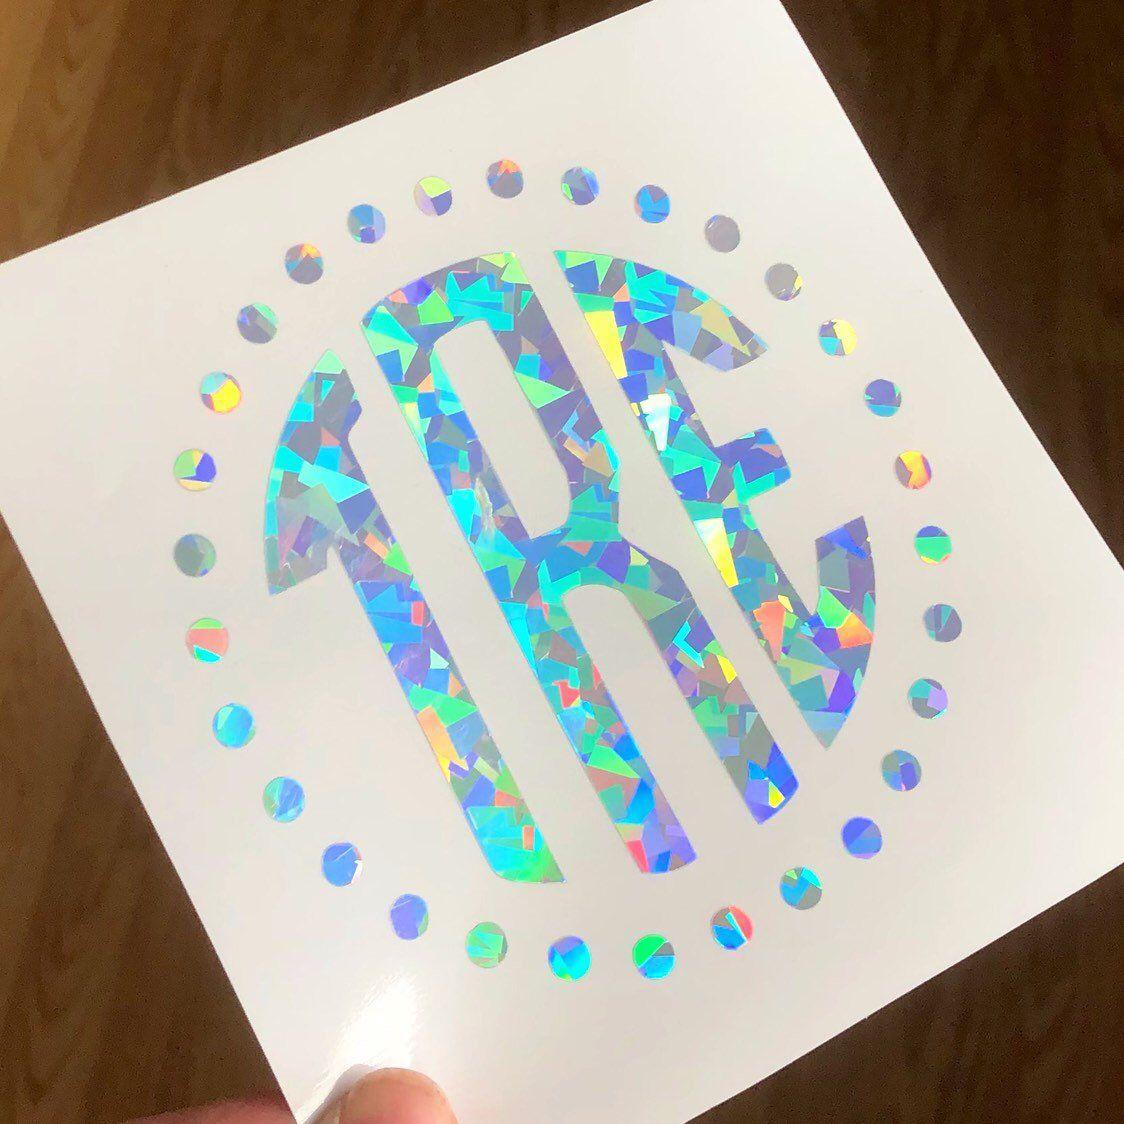 Holographic Monogram Decal Monogram Sticker Personalized Etsy Monogram Car Stickers Cute Car Decals Monogram Decal [ 1124 x 1124 Pixel ]